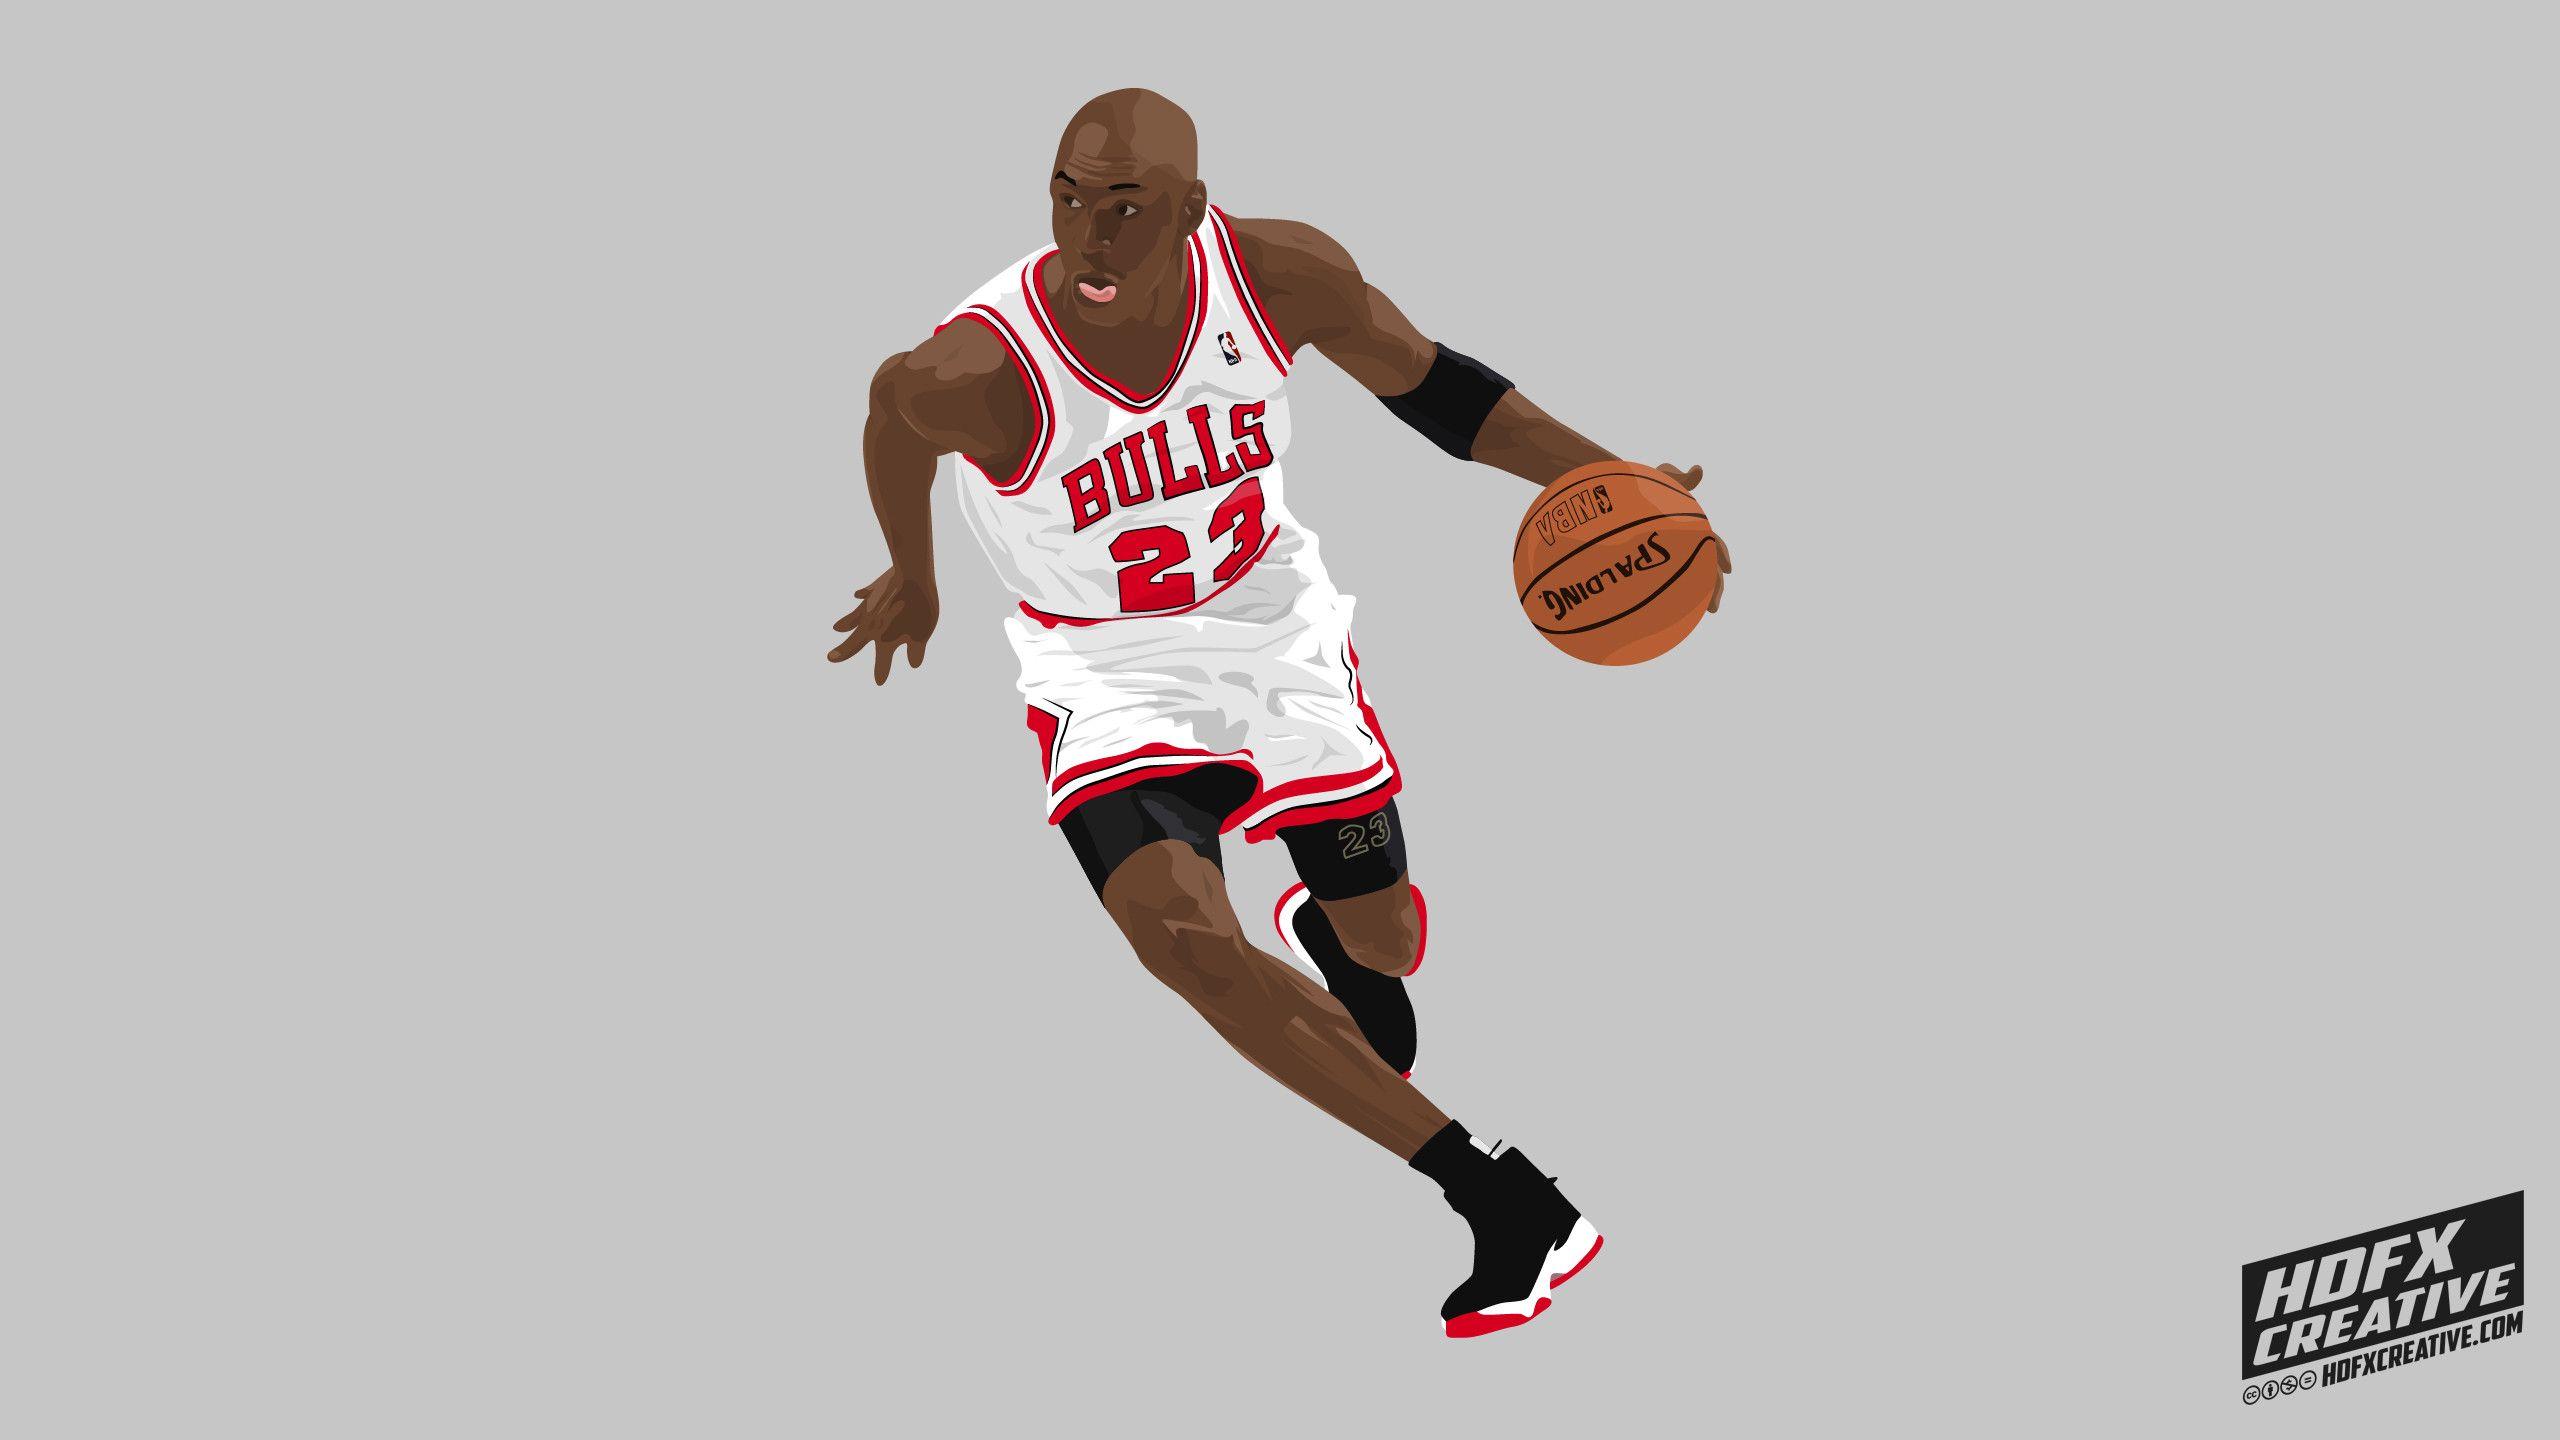 Cartoon Michael Jordan Wallpapers   Top Cartoon Michael 2560x1440